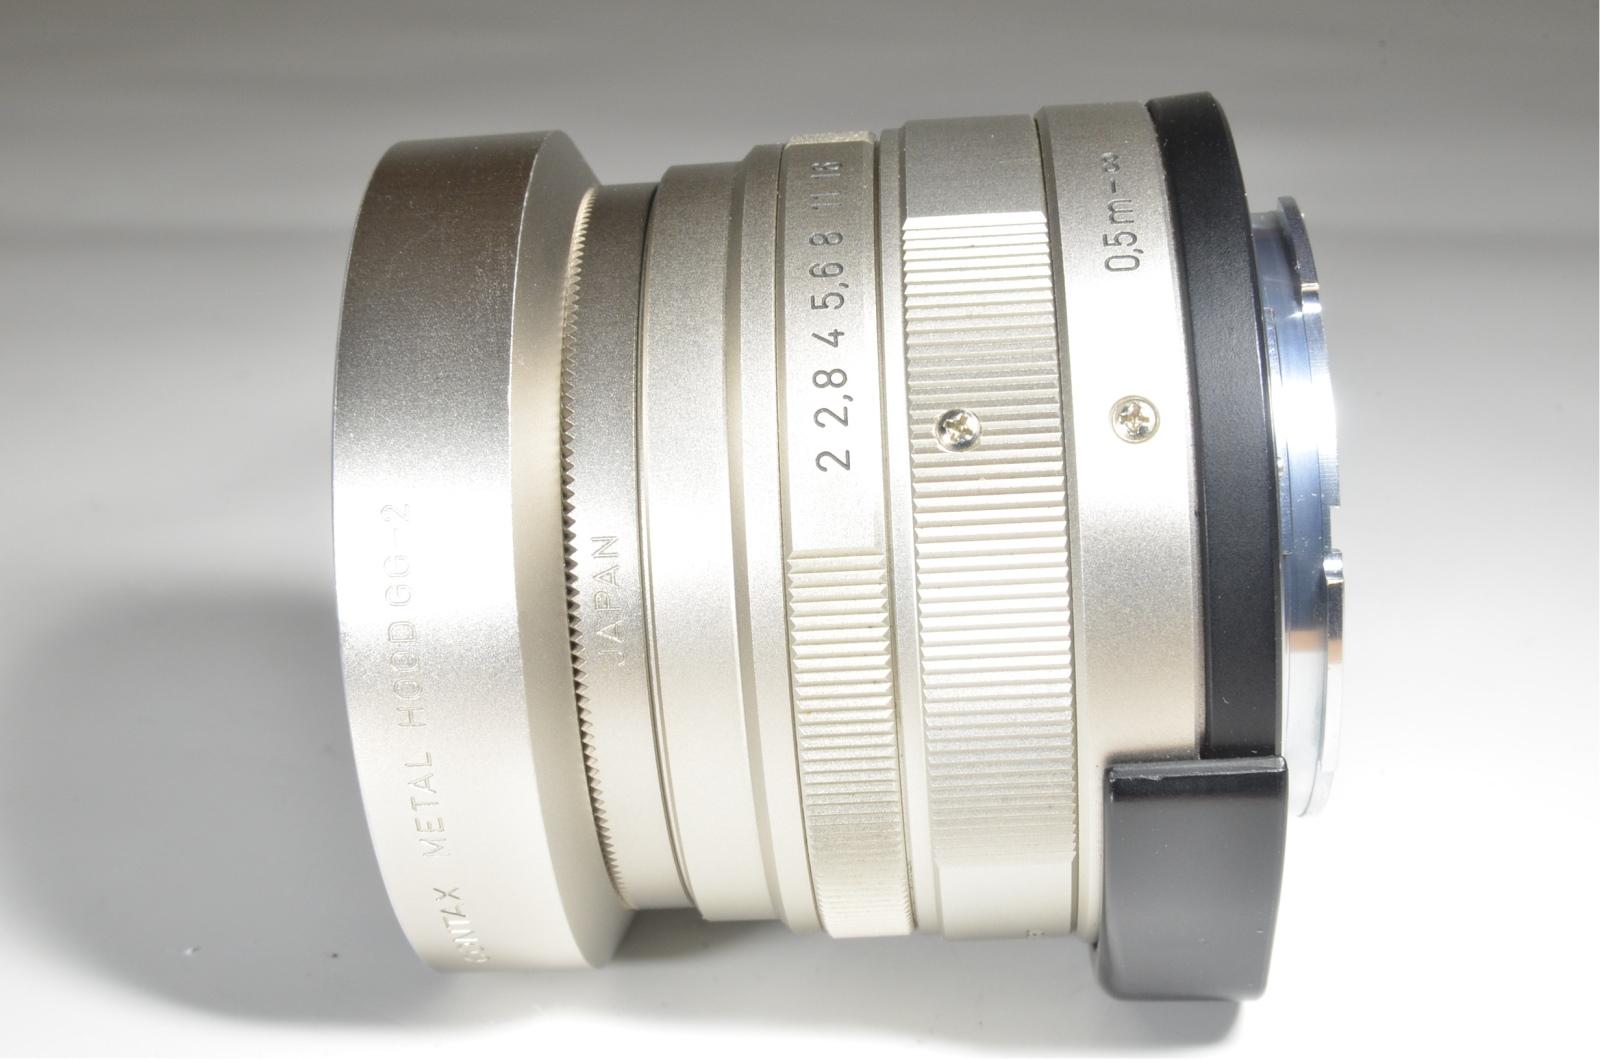 contax g2, full case, planar 45mm f2, biogon 28mm f2.8, sonnar 90mm f2.8, tla200